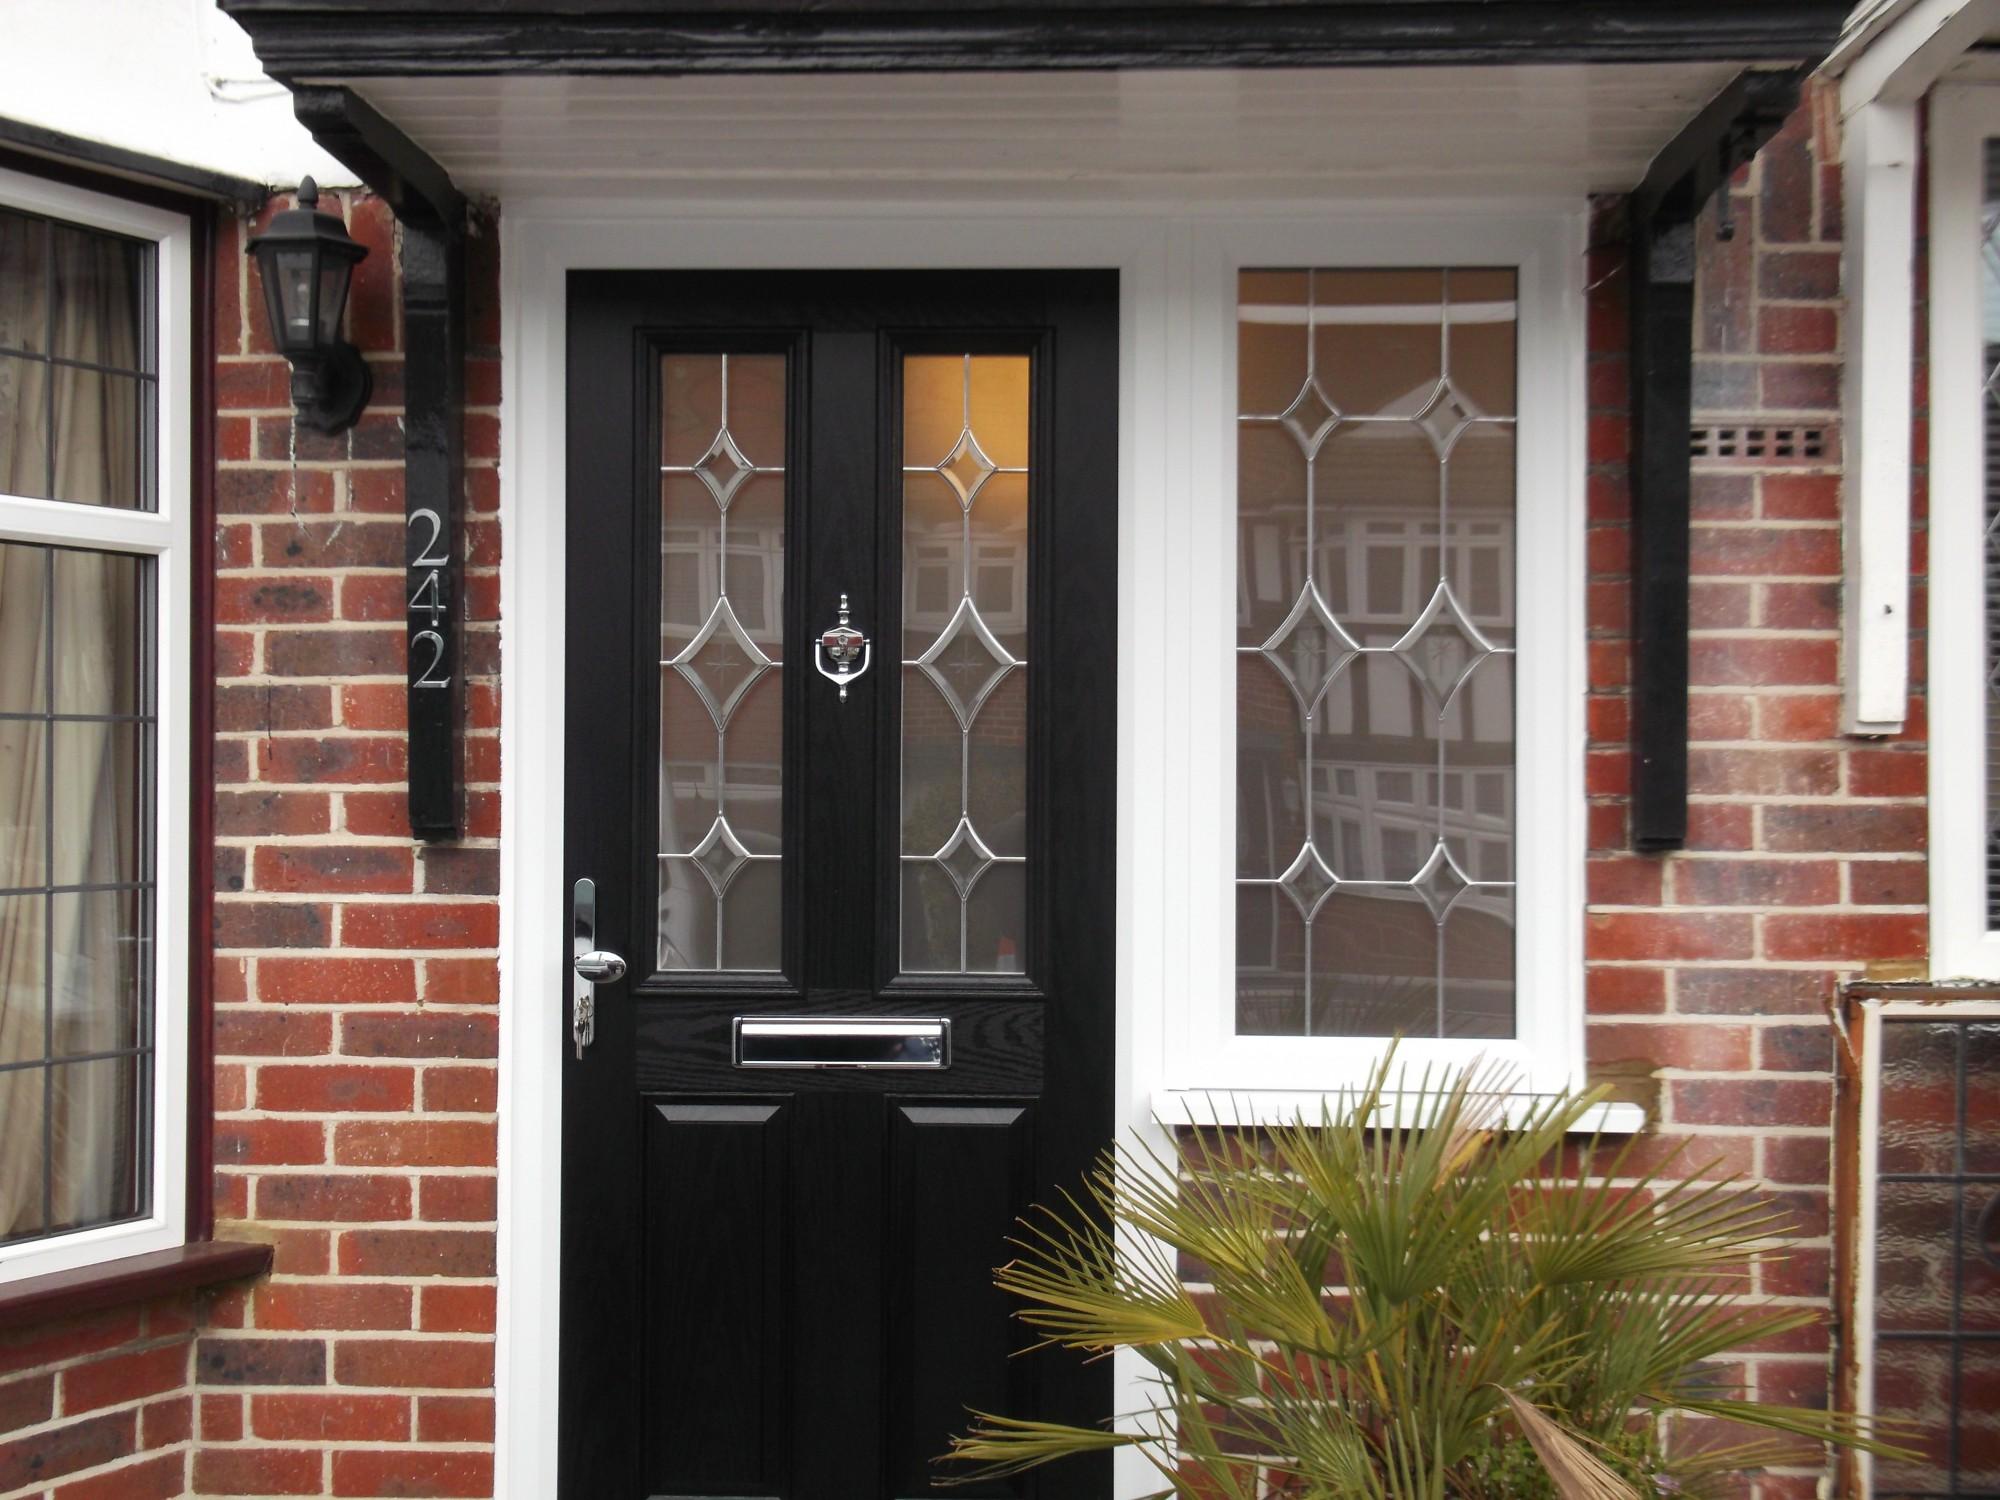 Composite Doors in Surrey & Composite Doors in Surrey | Surrey Composite Door Installations